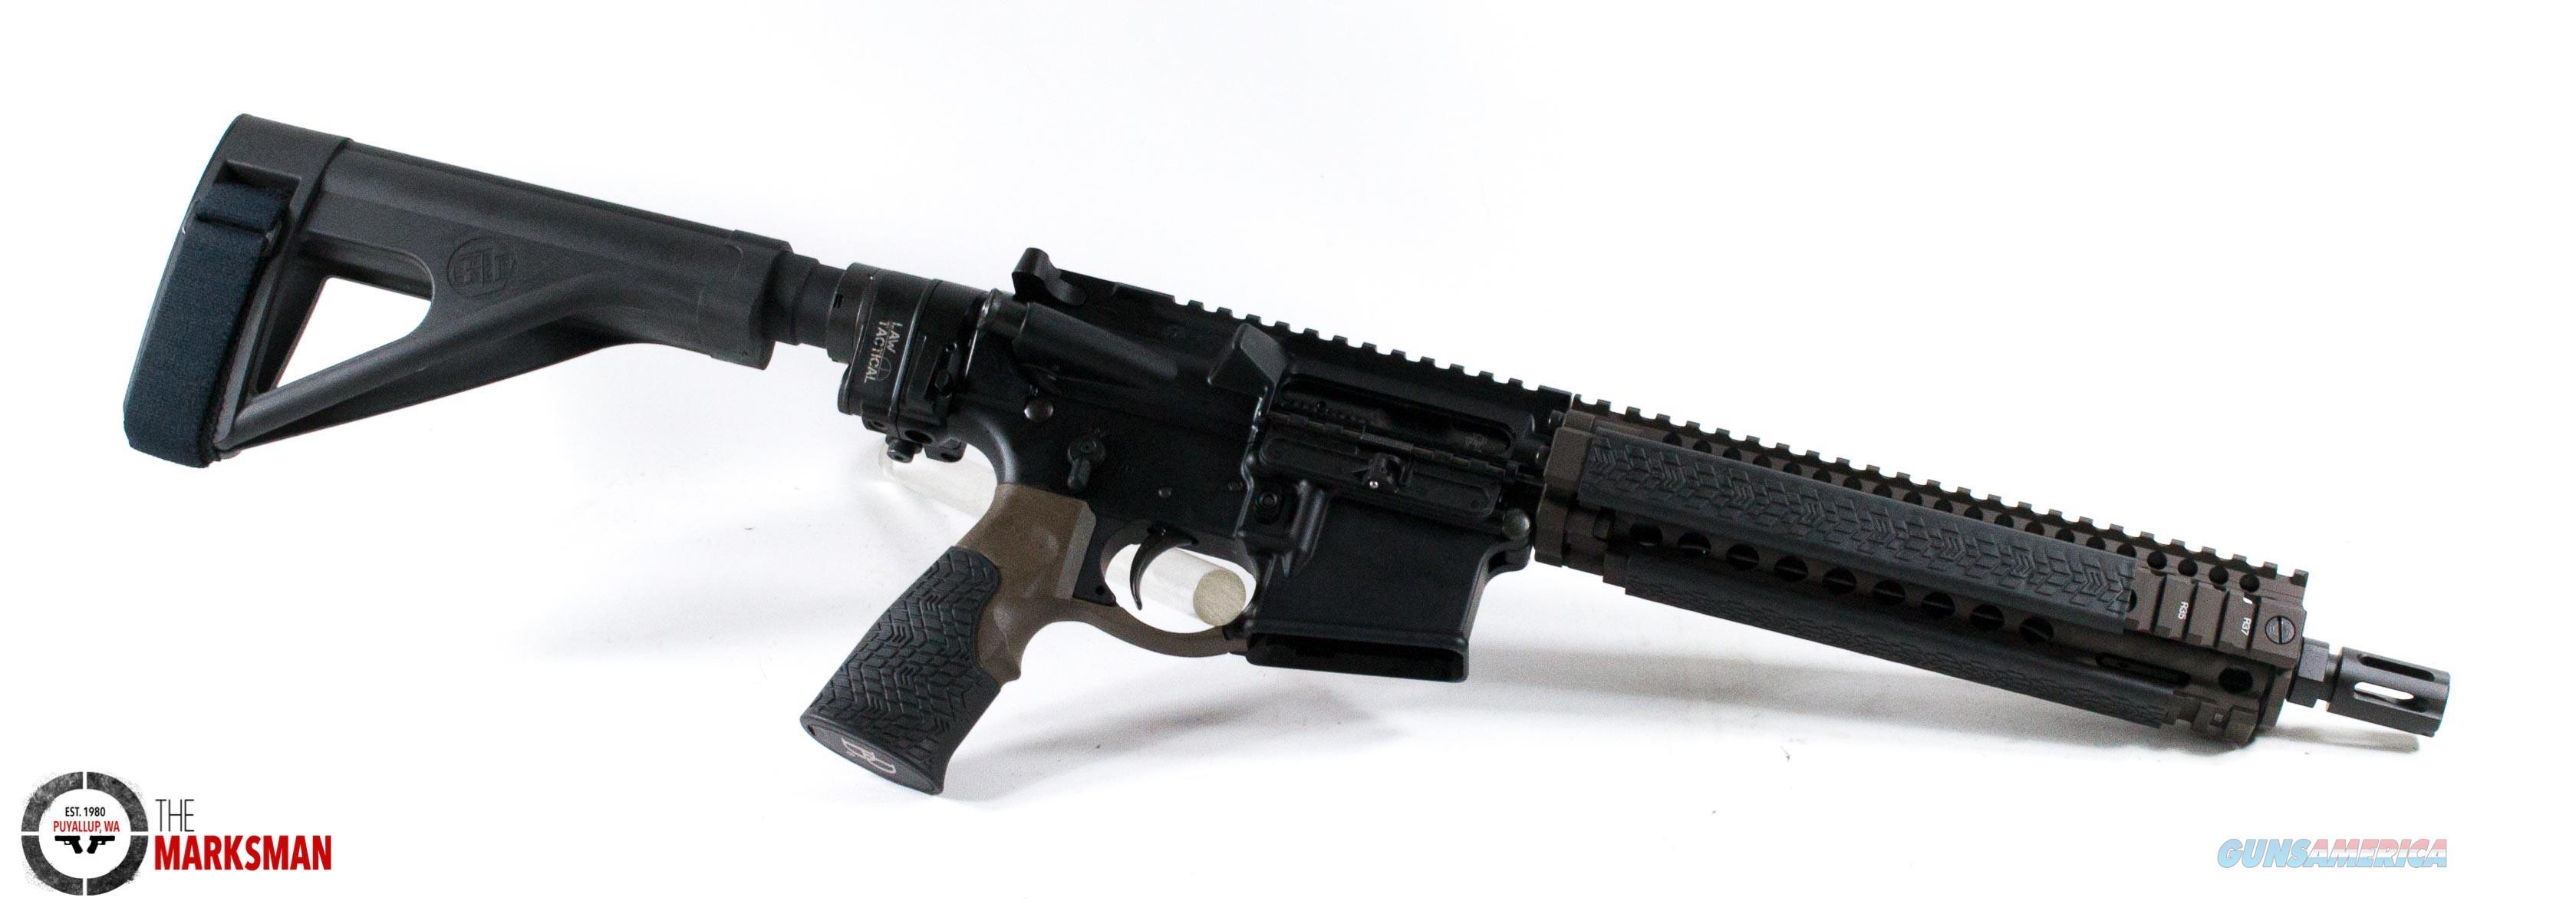 Daniel Defense MK18 Pistol, 5 56mm NATO NEW Law Tactical Gen III Folding  Stock Adaptor, Free Shipping